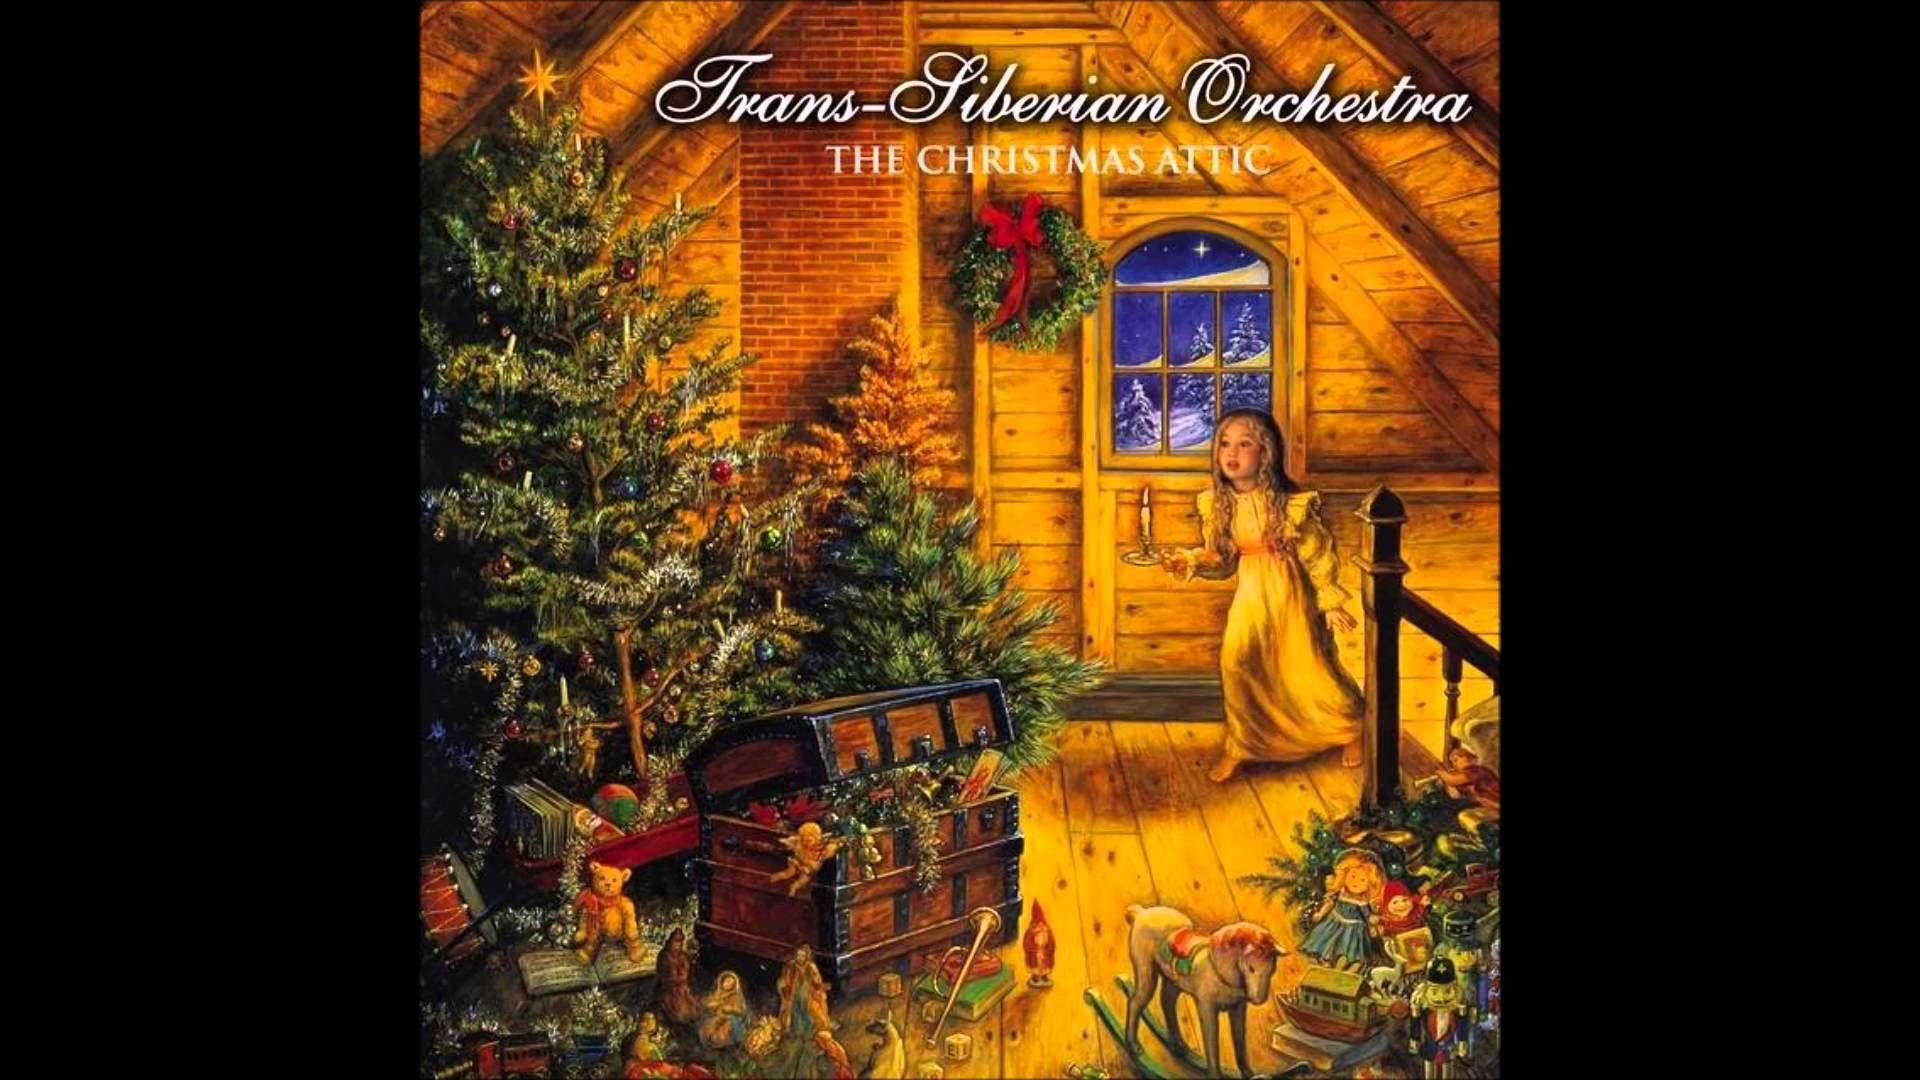 Trans Siberian Orchestra The Christmas Attic Full Album